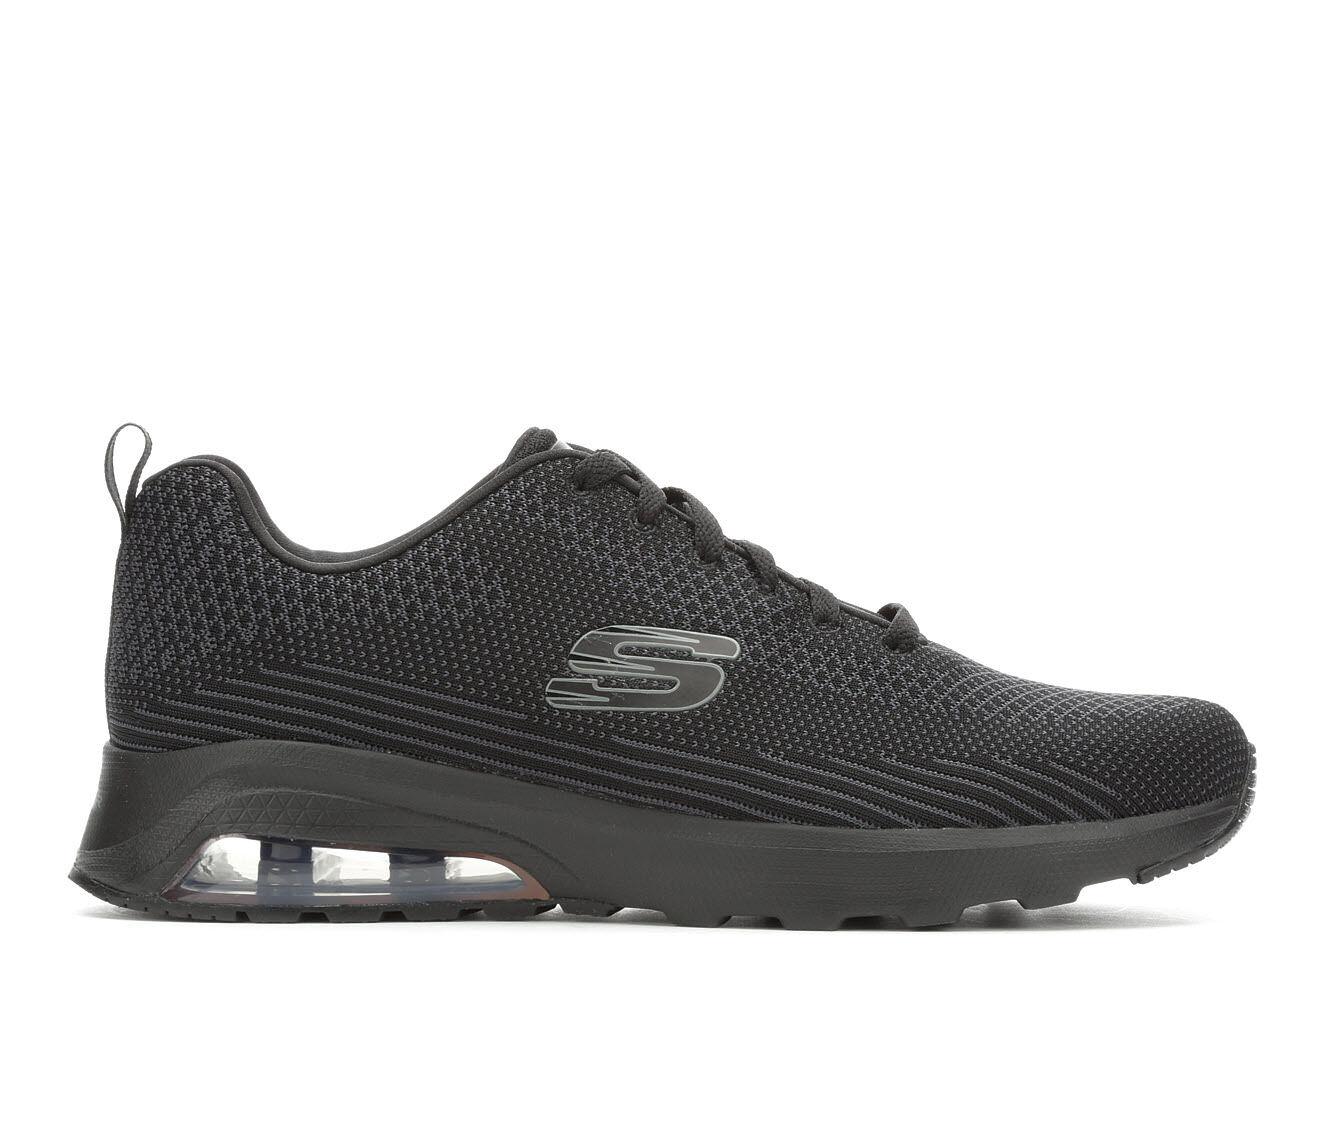 Men's Skechers Skech AIr 51490 Running Shoes Blk/Blk BBK